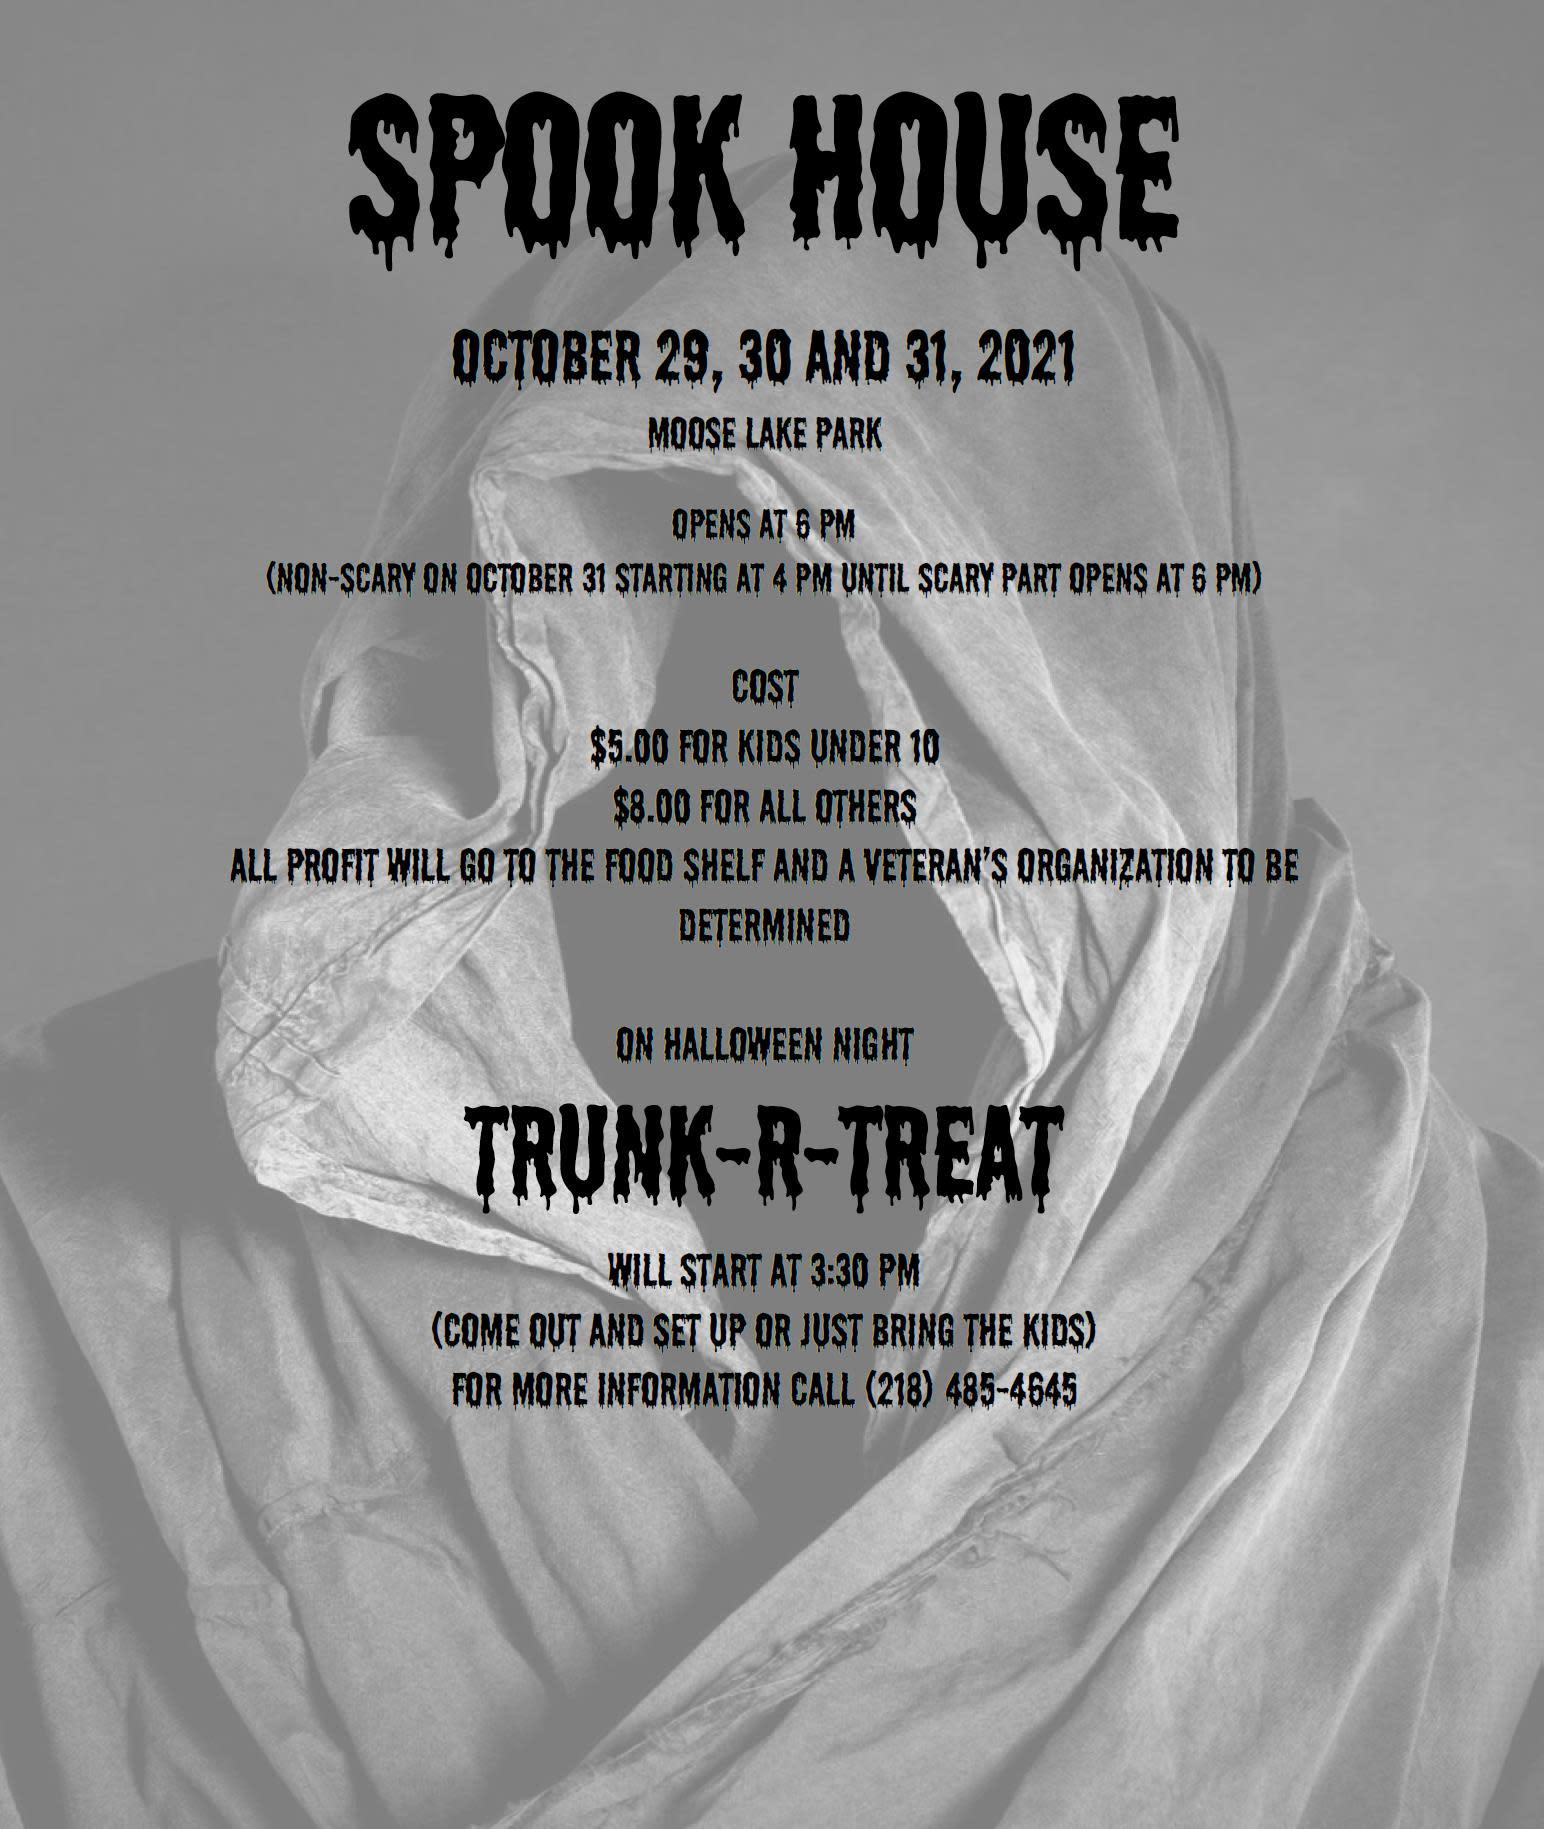 Spook house flyer